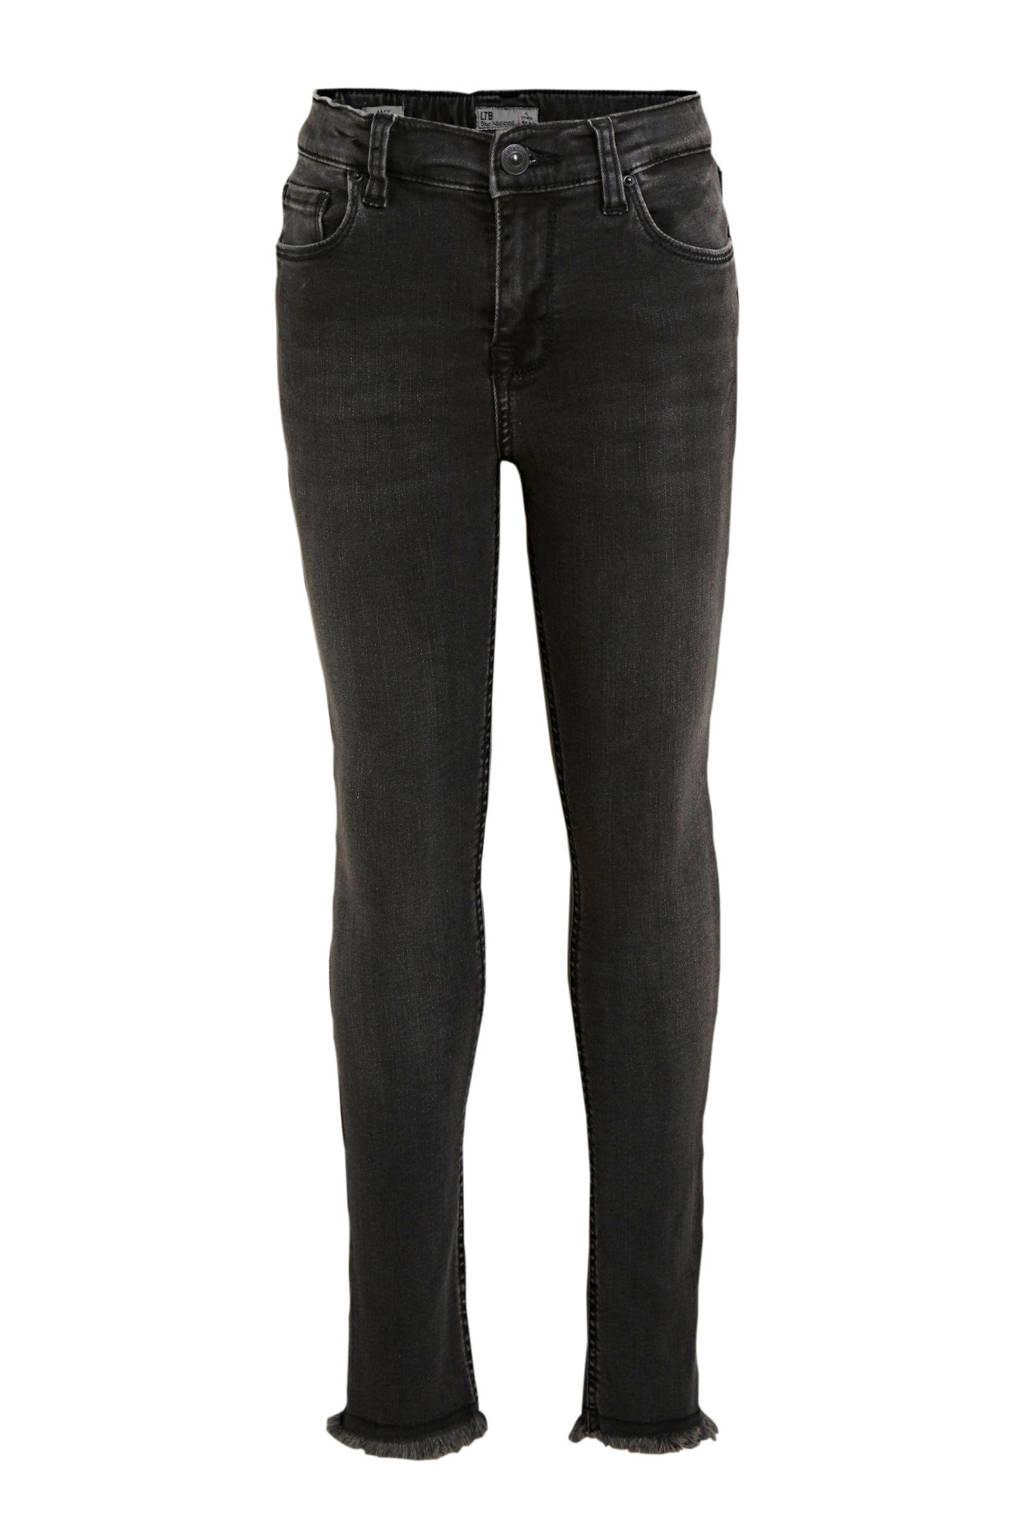 LTB cropped high waist skinny jeans Amy latore wash, Latore wash